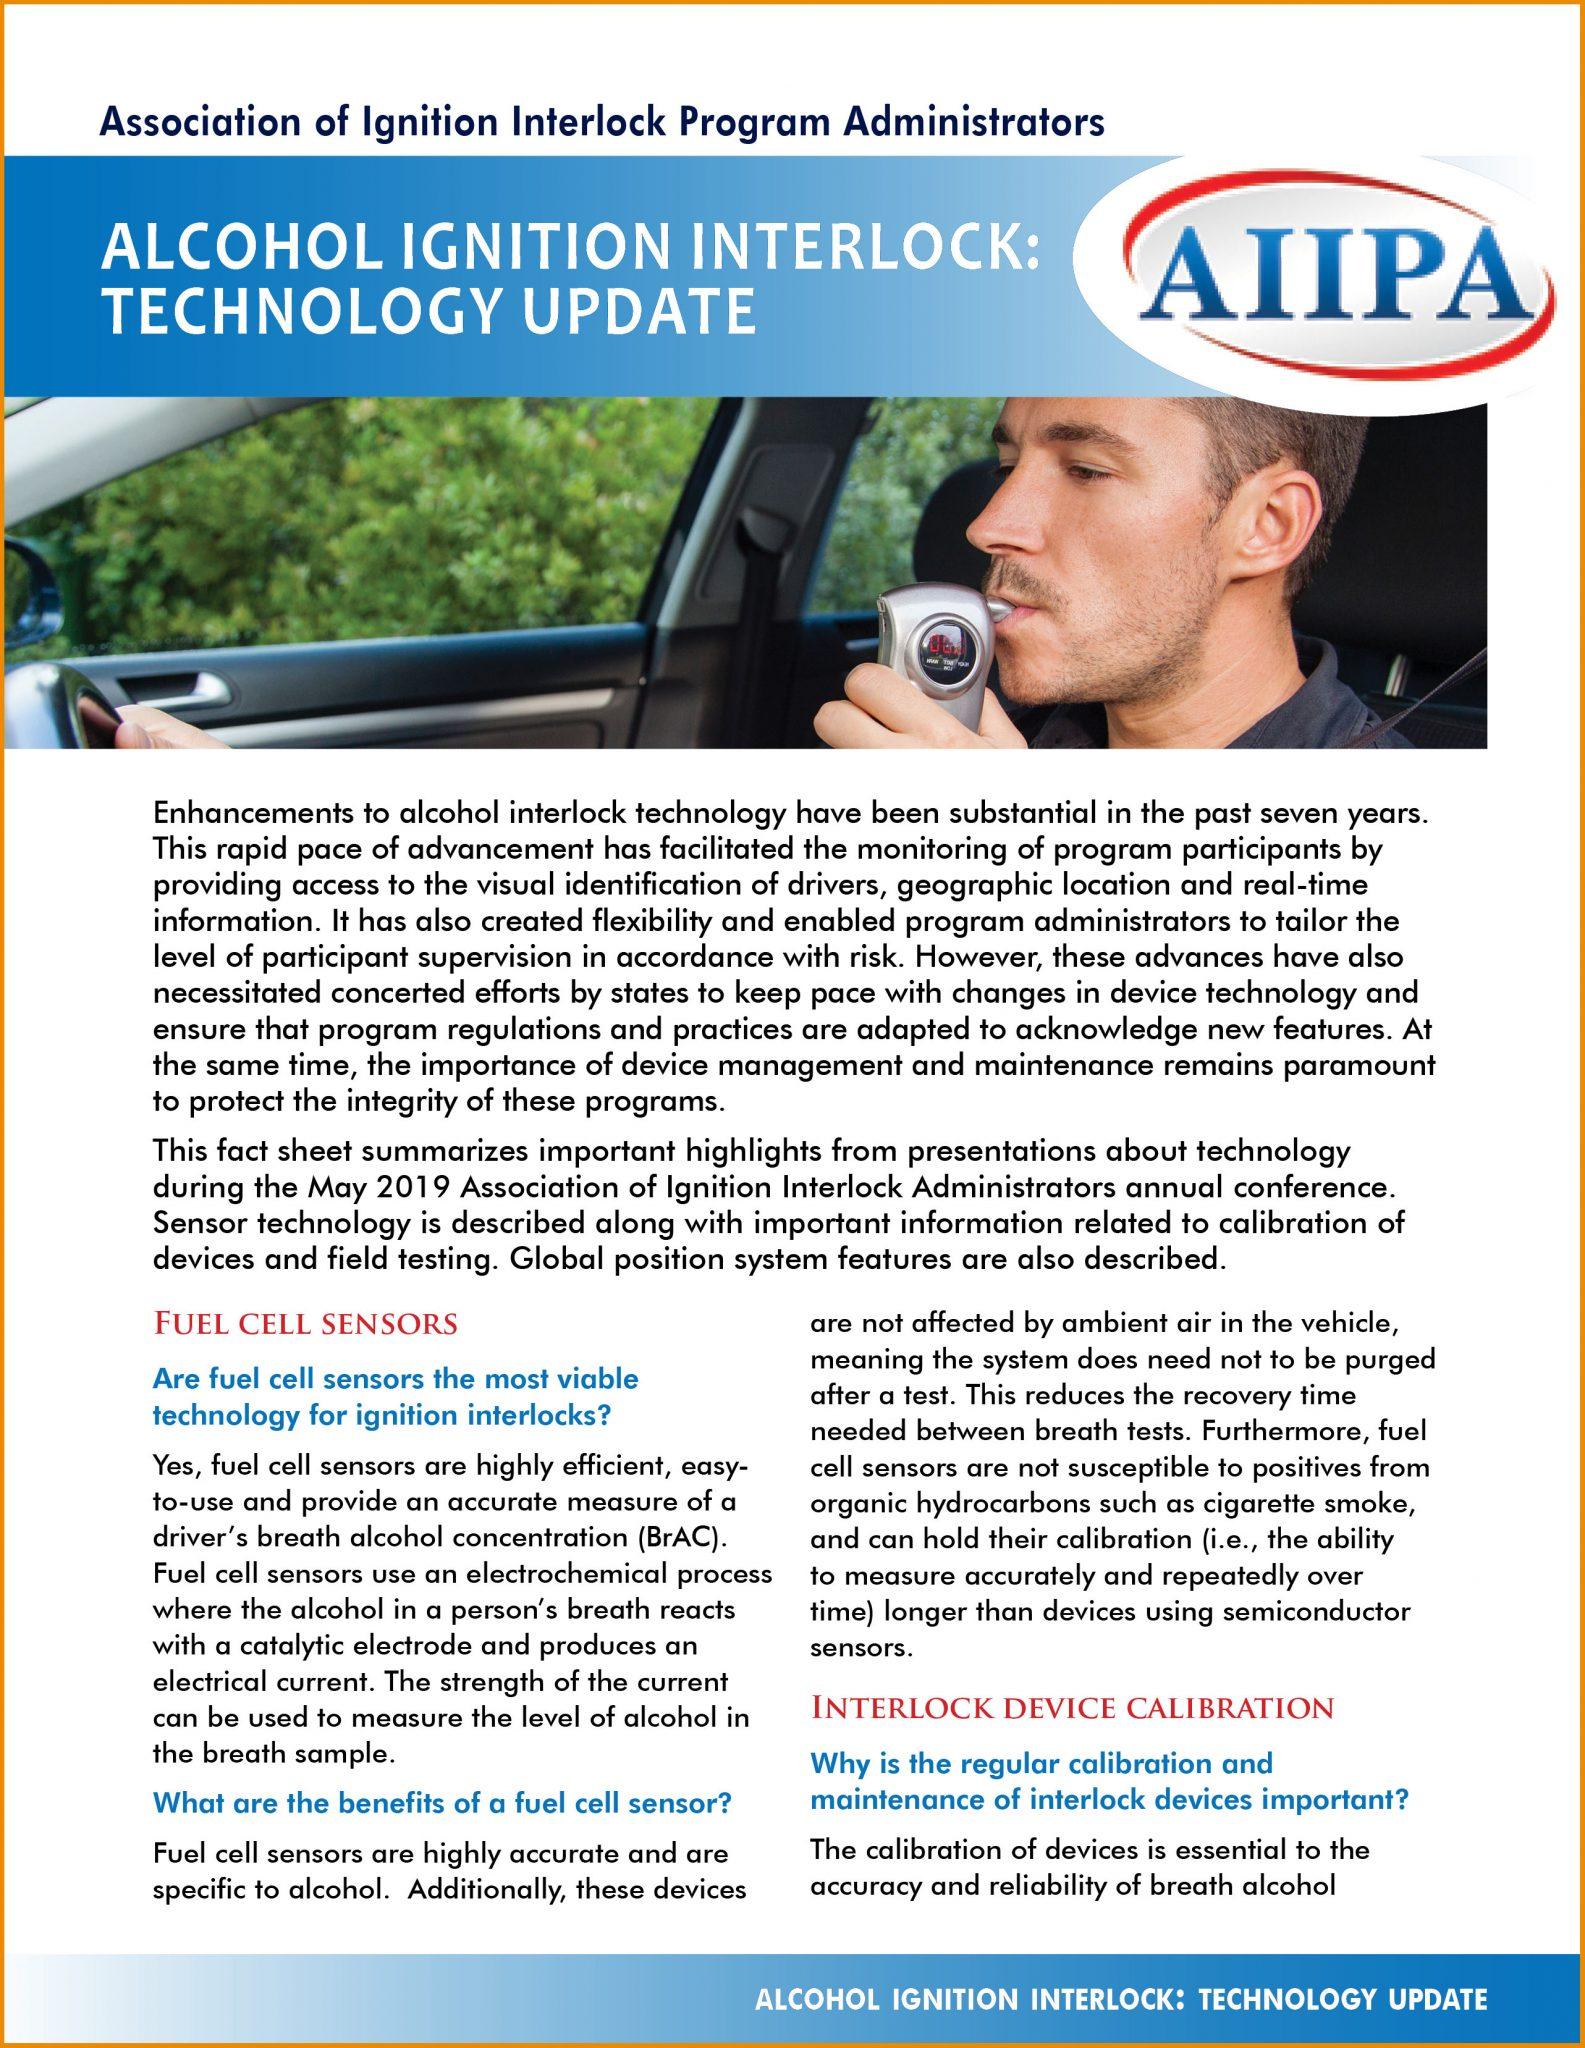 Alcohol Ignition Interlock: Technology Update